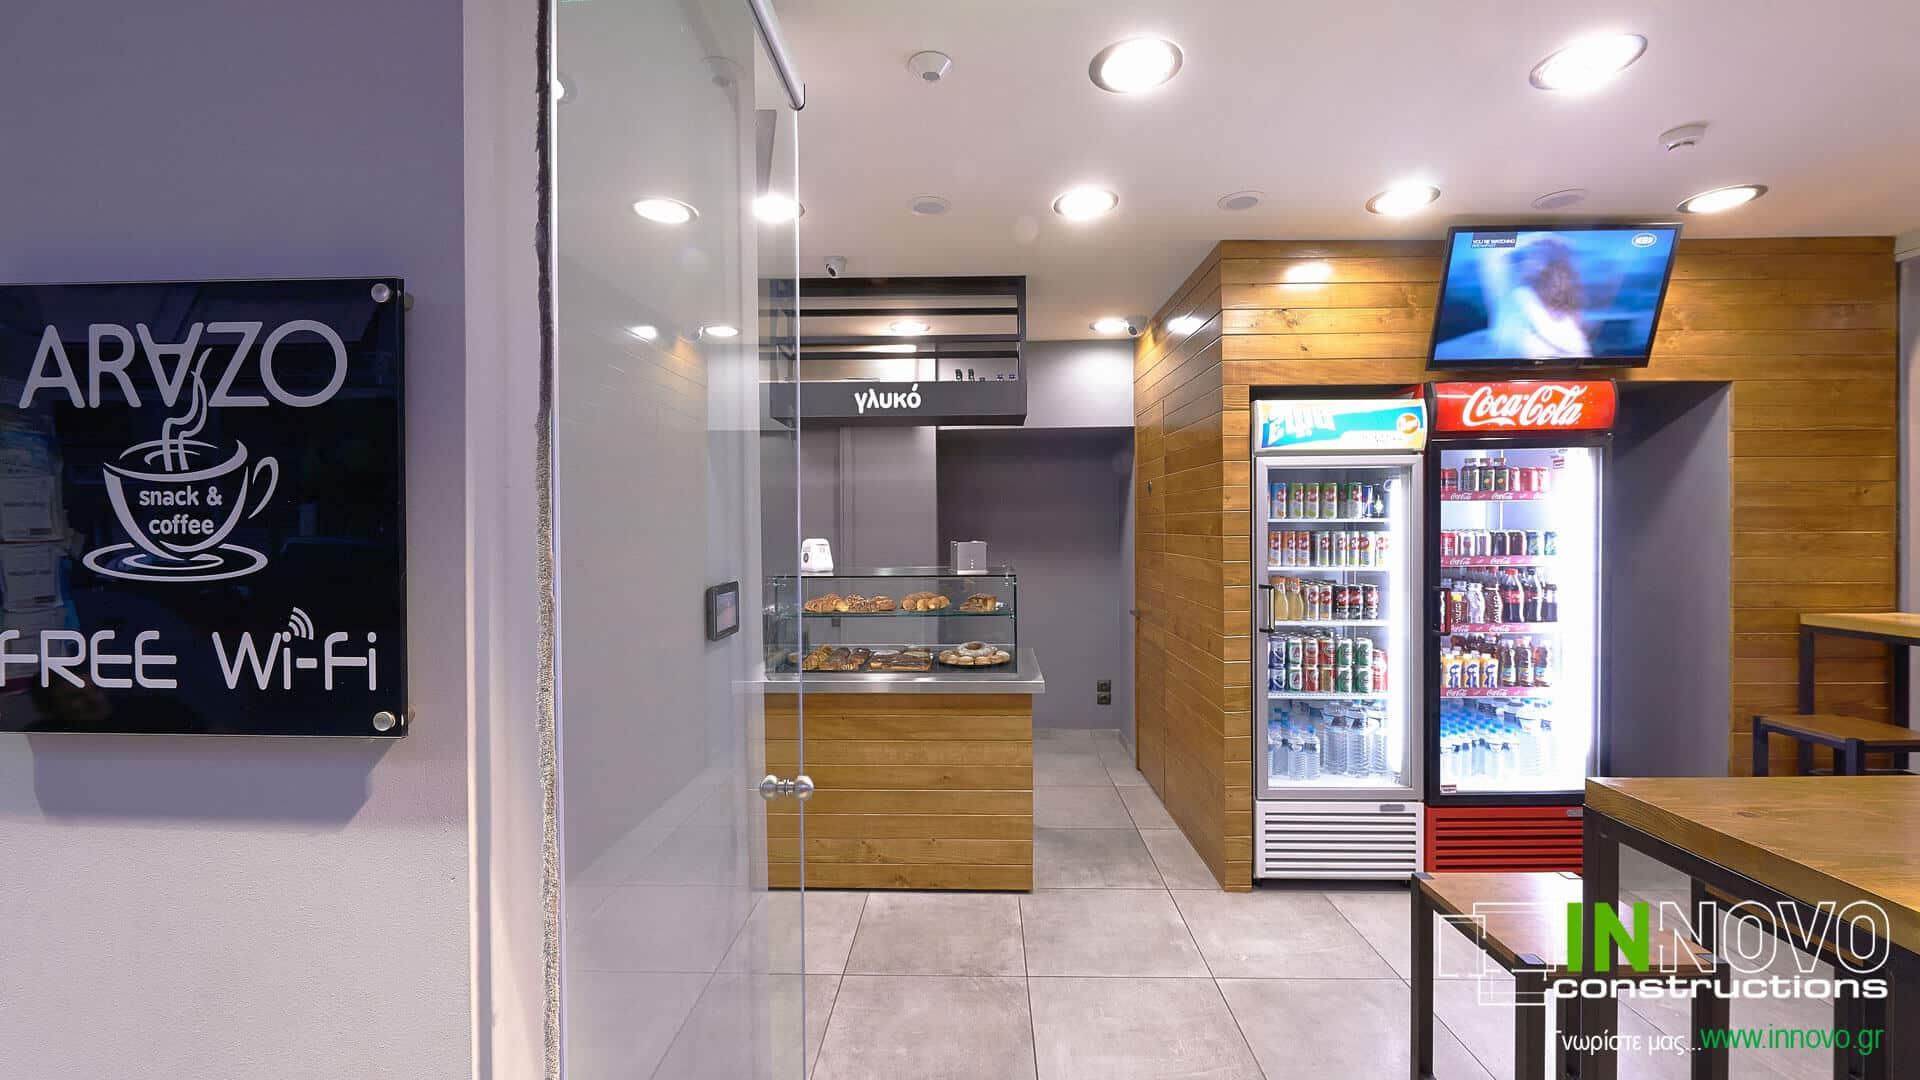 anakainisi-snack-cafe-renovation-snack-cafe-peiraias-1545-4